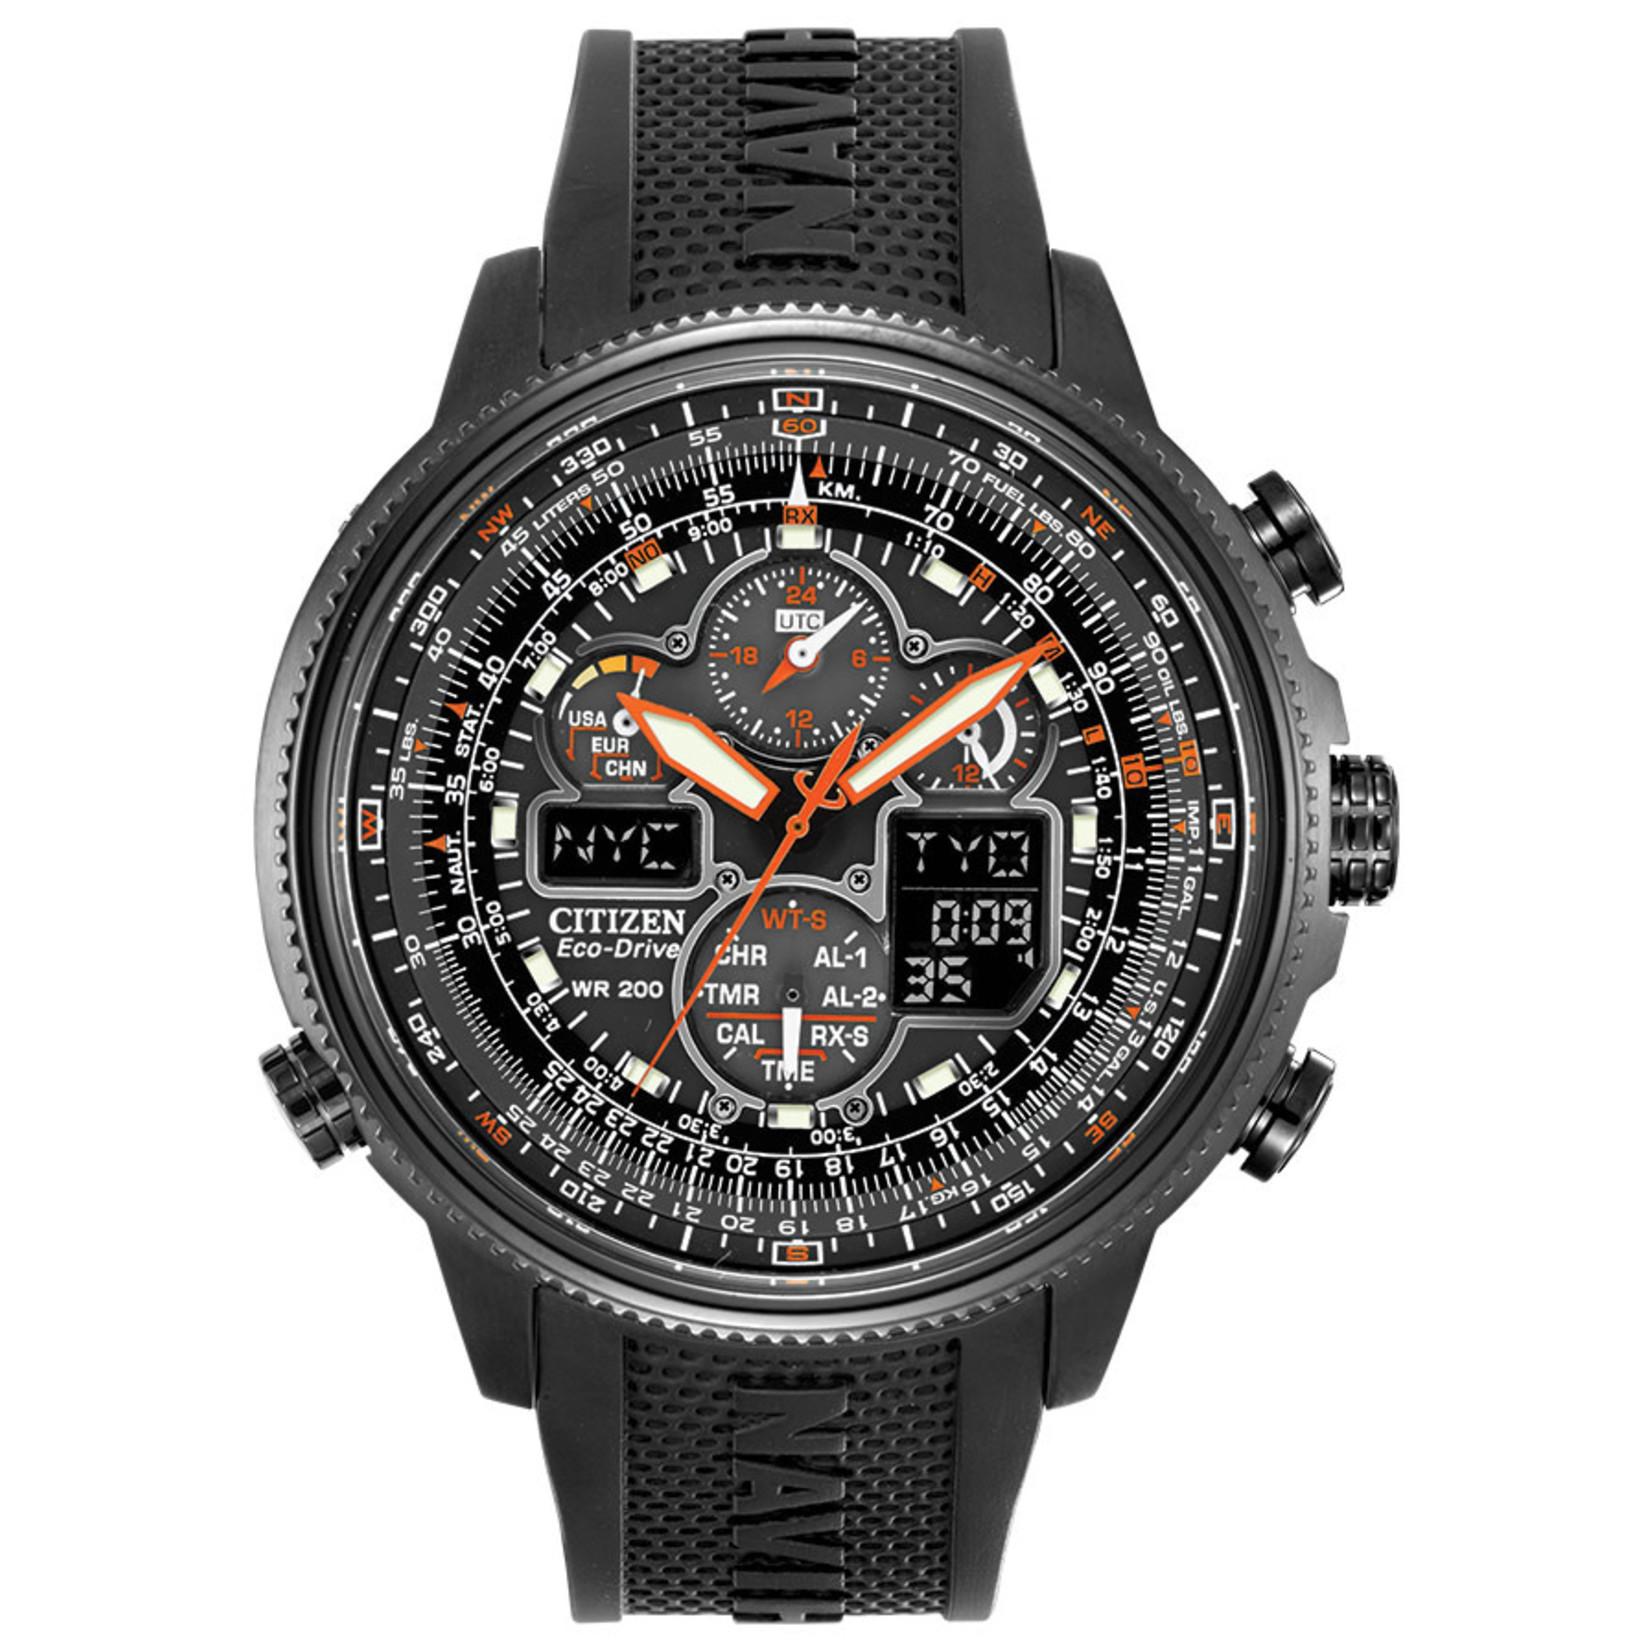 Citizen Citizen Promaster Navihawk A-T. With Atomic Clock Watch